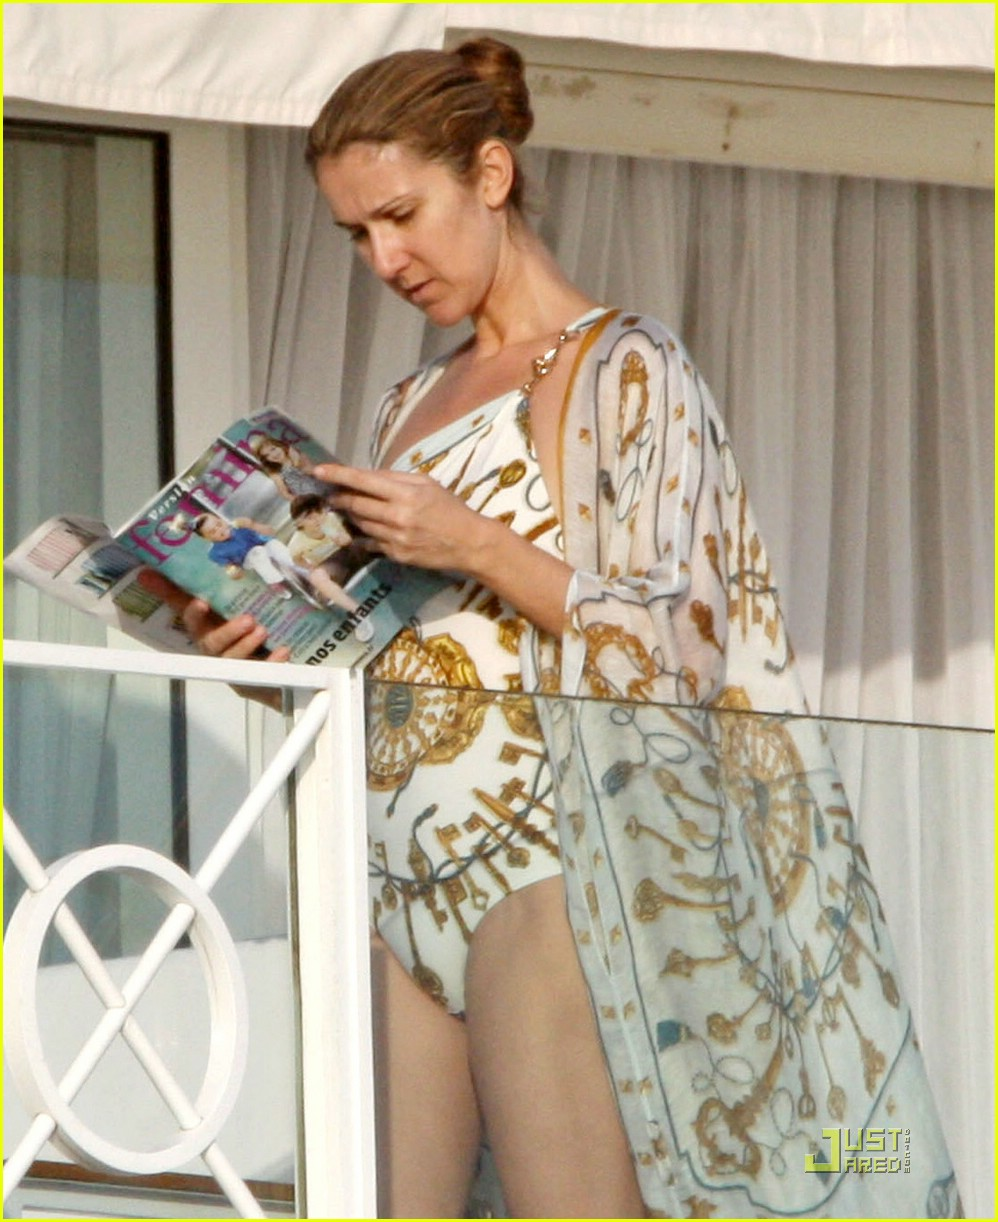 Celine Dion photo 9 of 223 pics, wallpaper - photo #46311